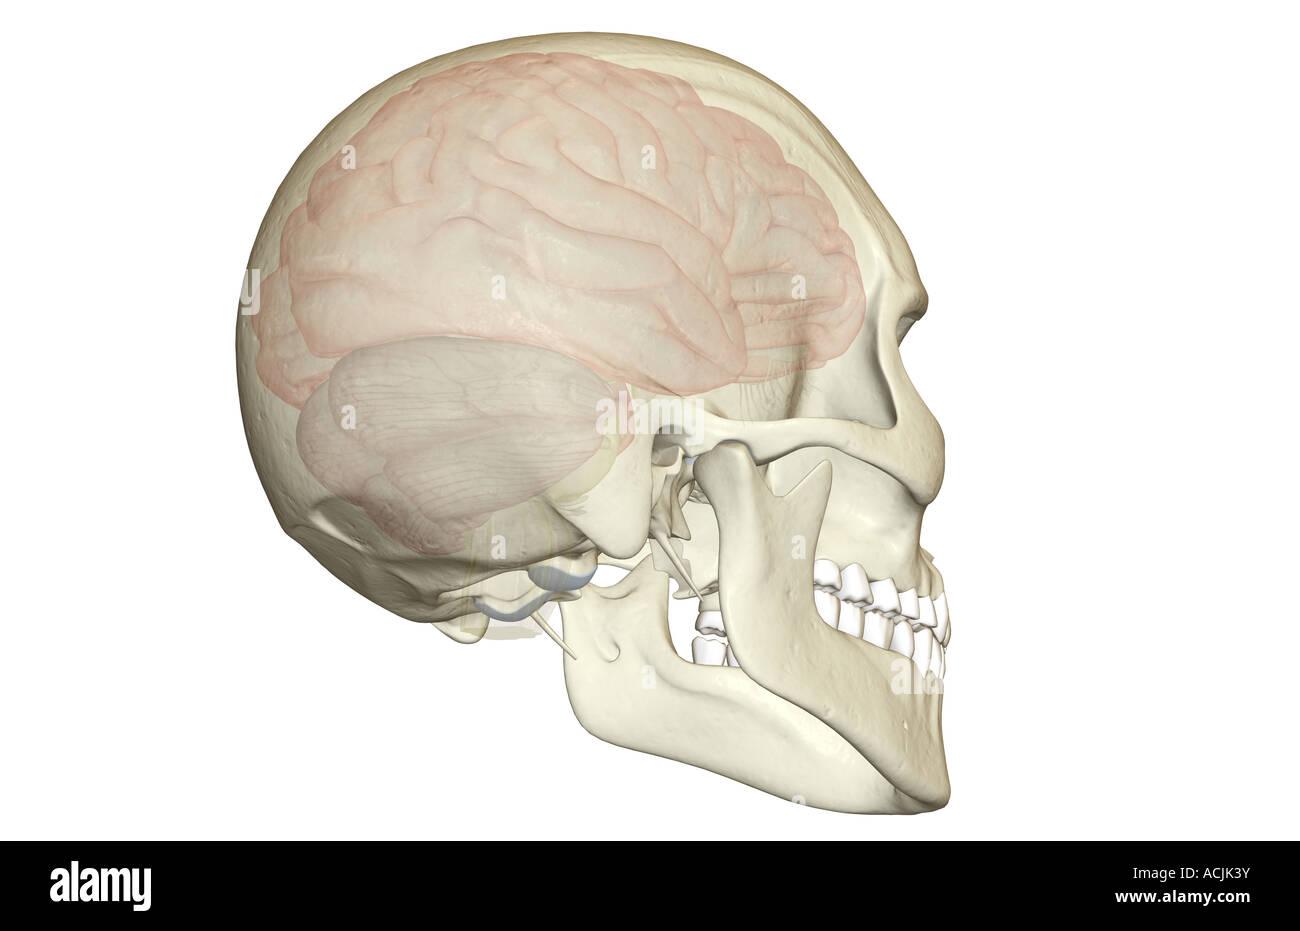 Cerebral Hemisphere Stockfotos & Cerebral Hemisphere Bilder - Alamy